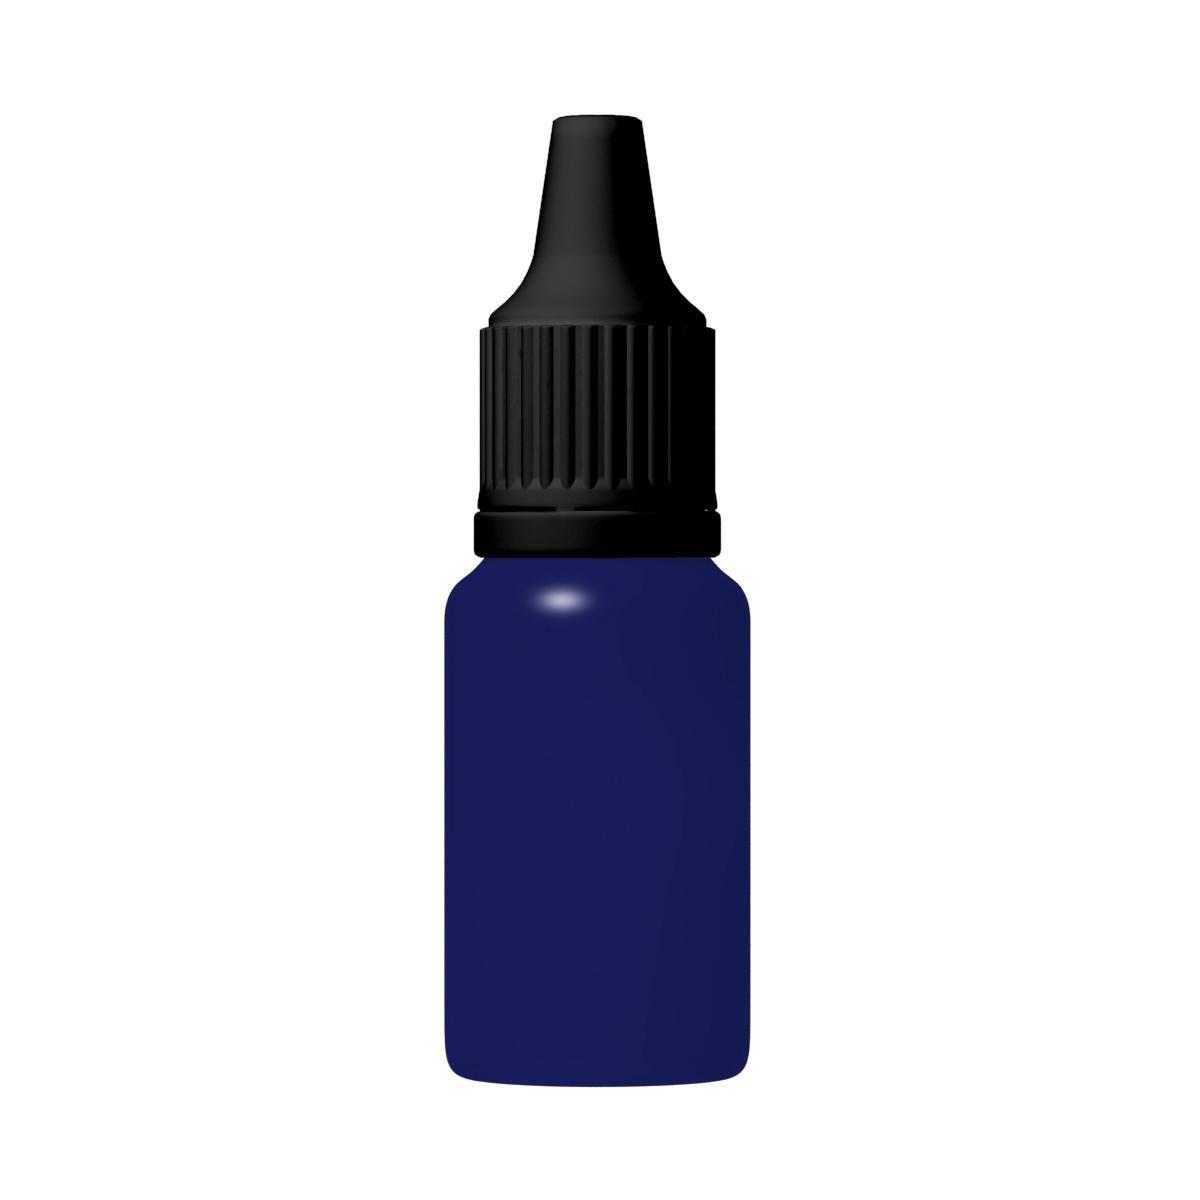 TFC Giessharz Farbpaste blau RAL5022 nachtblau